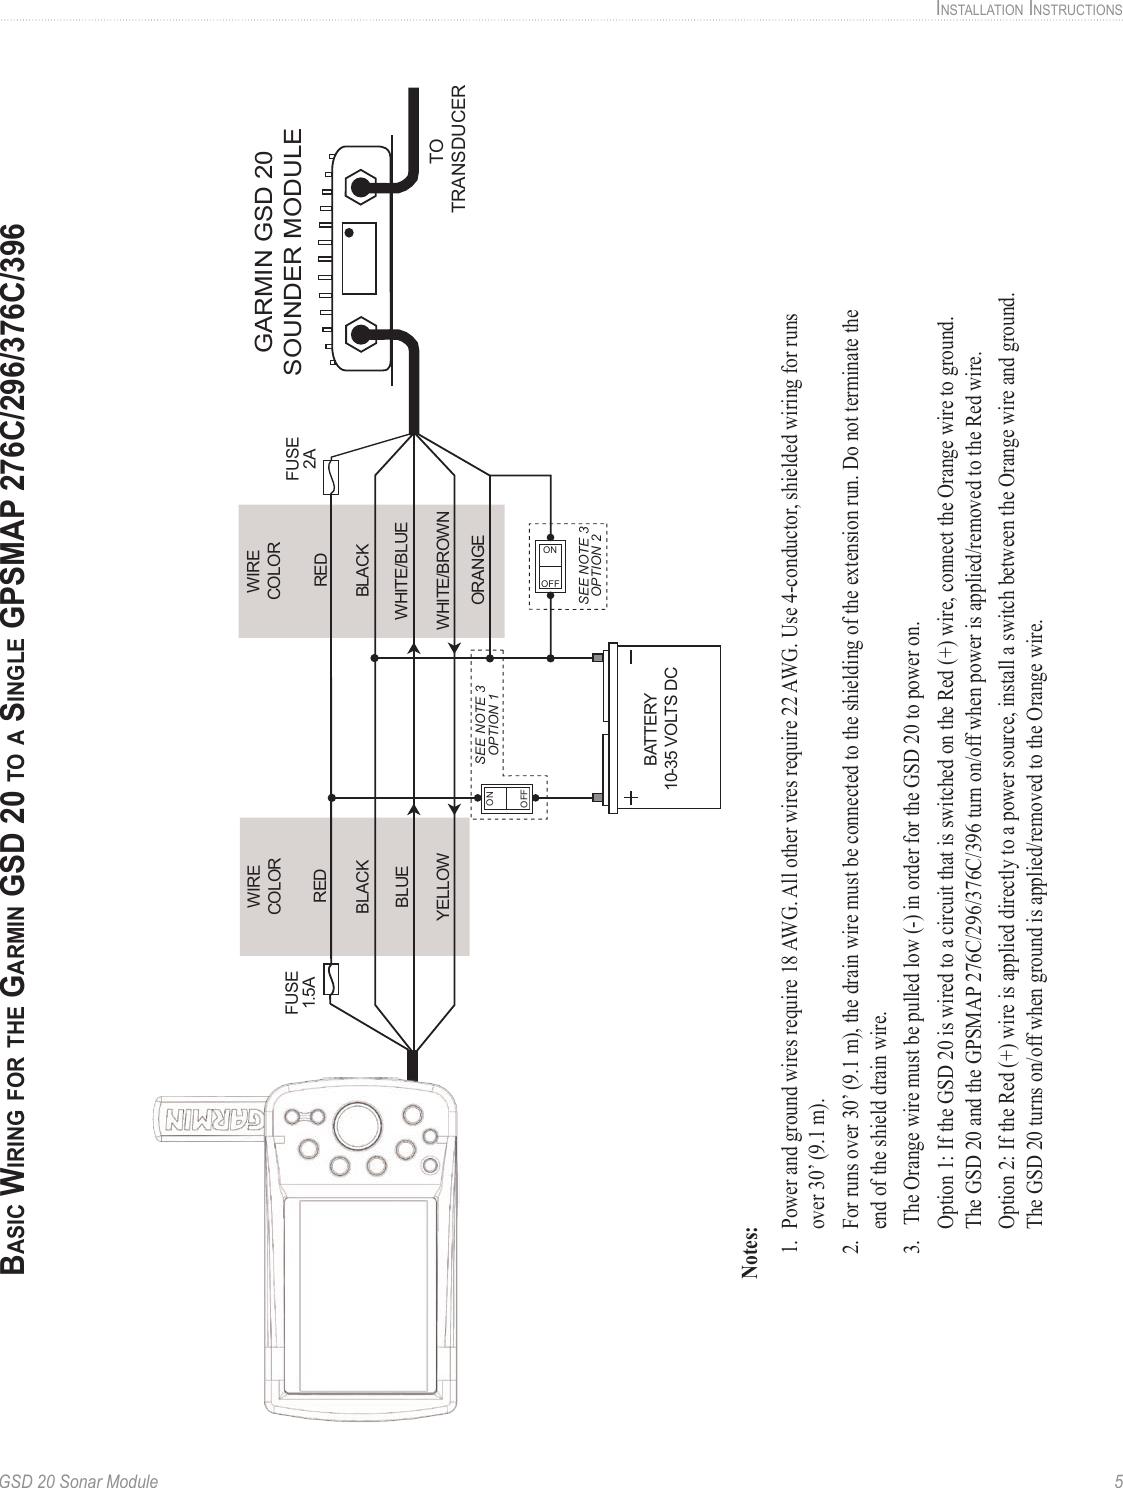 Garmin Gsd 20 Wiring Diagram - Wiring Diagrams Show on